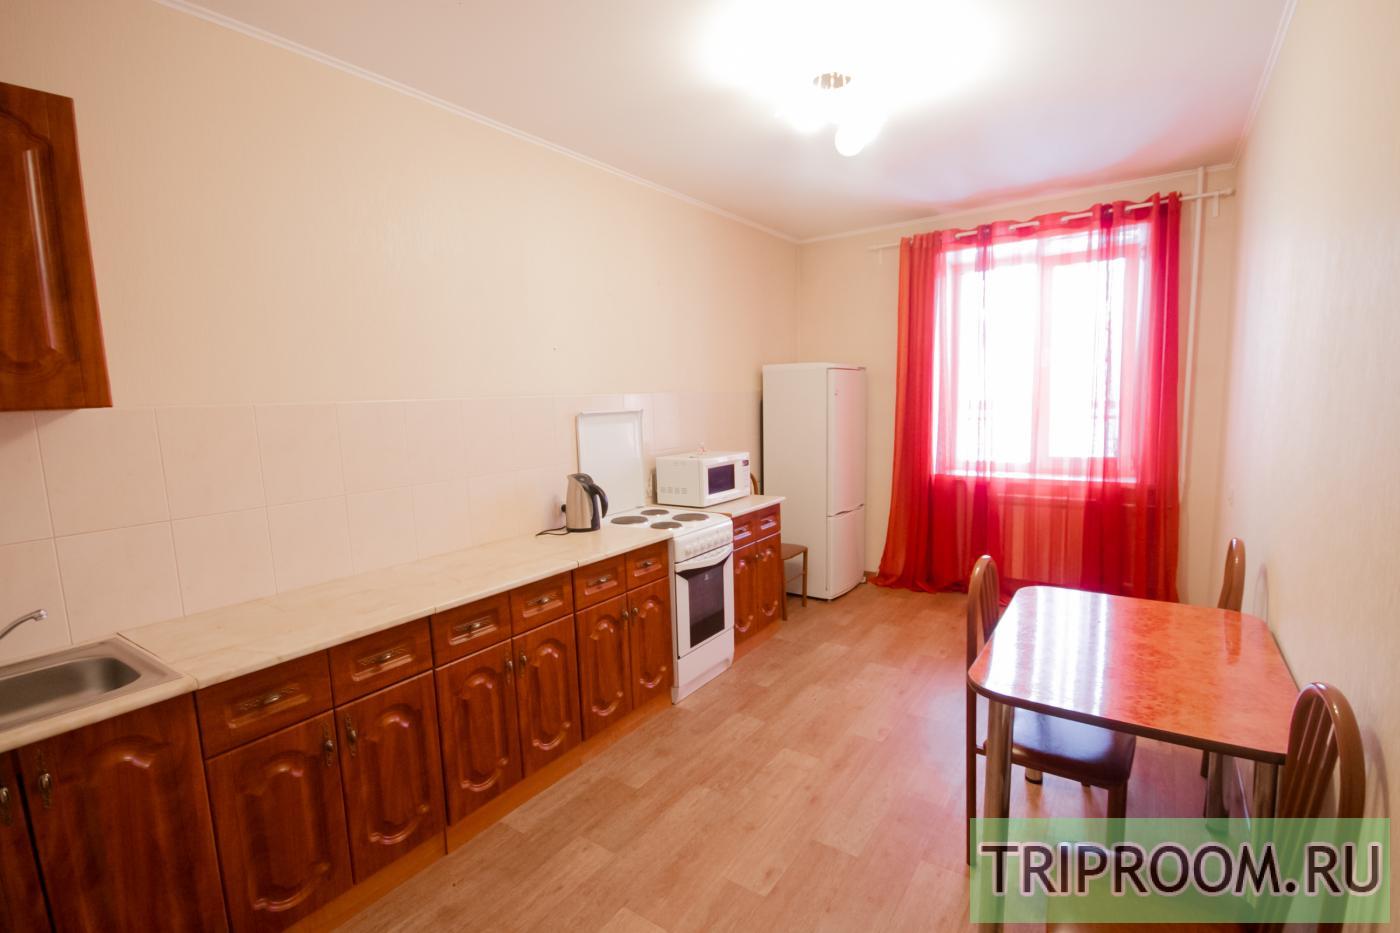 1-комнатная квартира посуточно (вариант № 9382), ул. Галущака улица, фото № 7